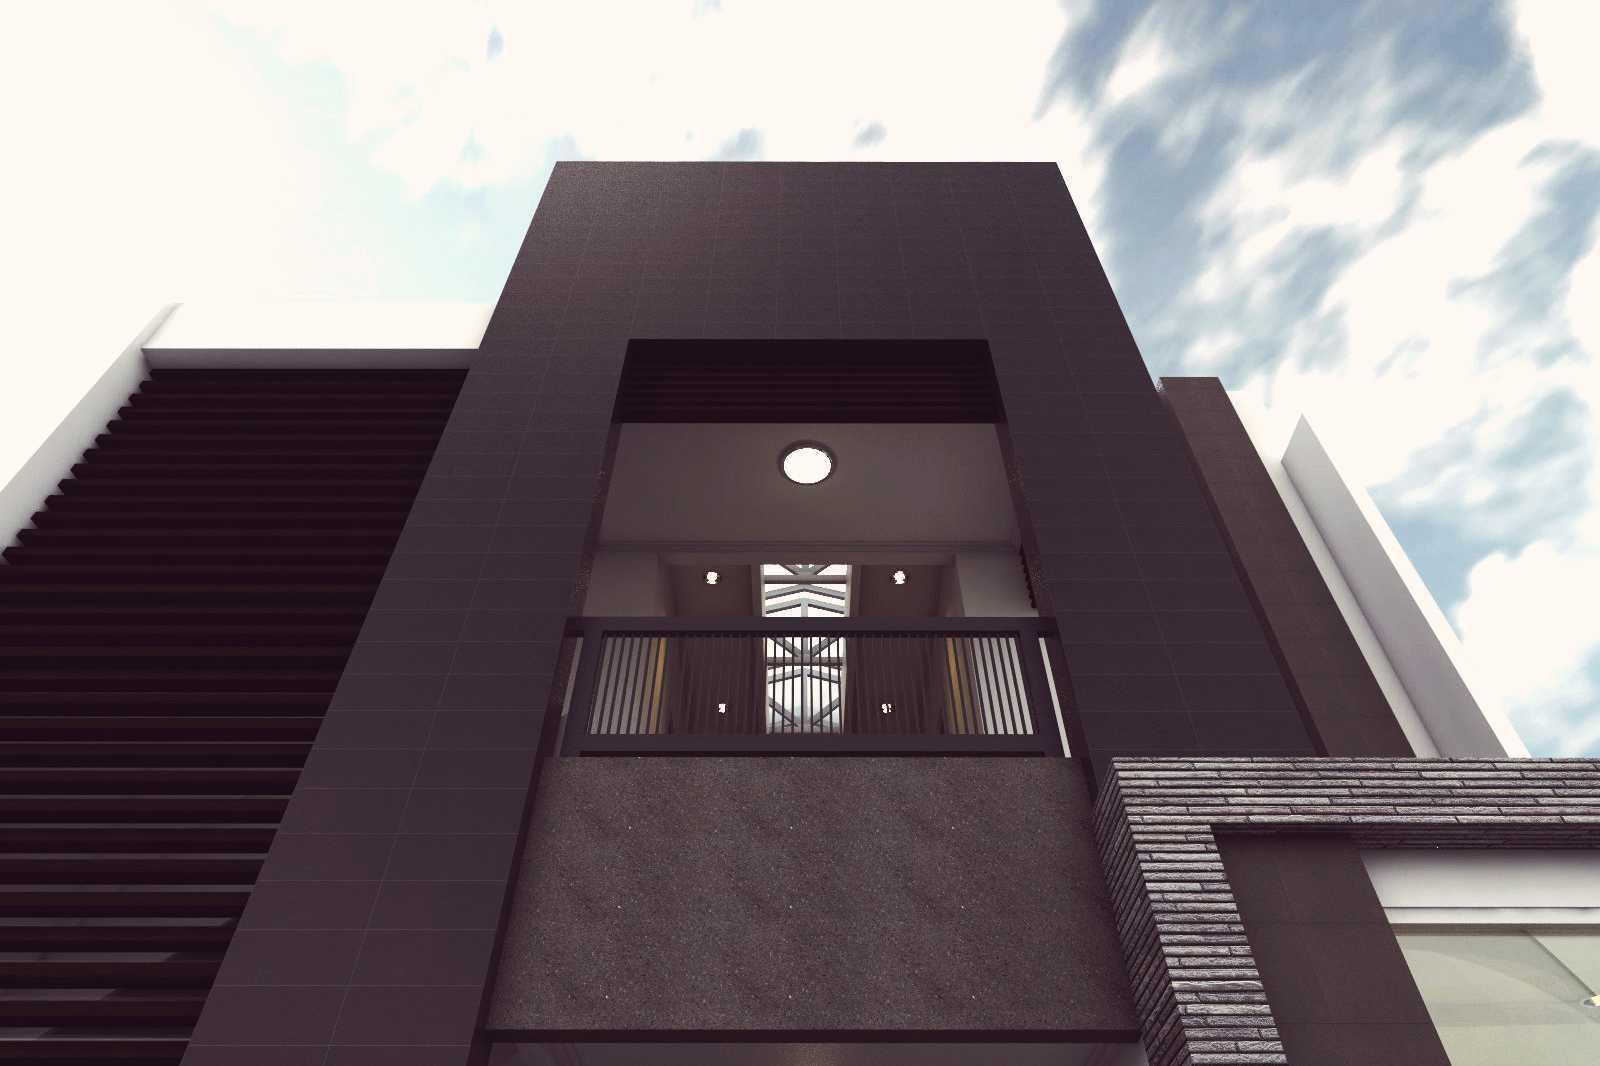 Muda Arsitek Rahmat's Boarding House Surabaya, Kota Sby, Jawa Timur, Indonesia Surabaya, Kota Sby, Jawa Timur, Indonesia Muda-Arsitek-Rahmats-Boarding-House  97710